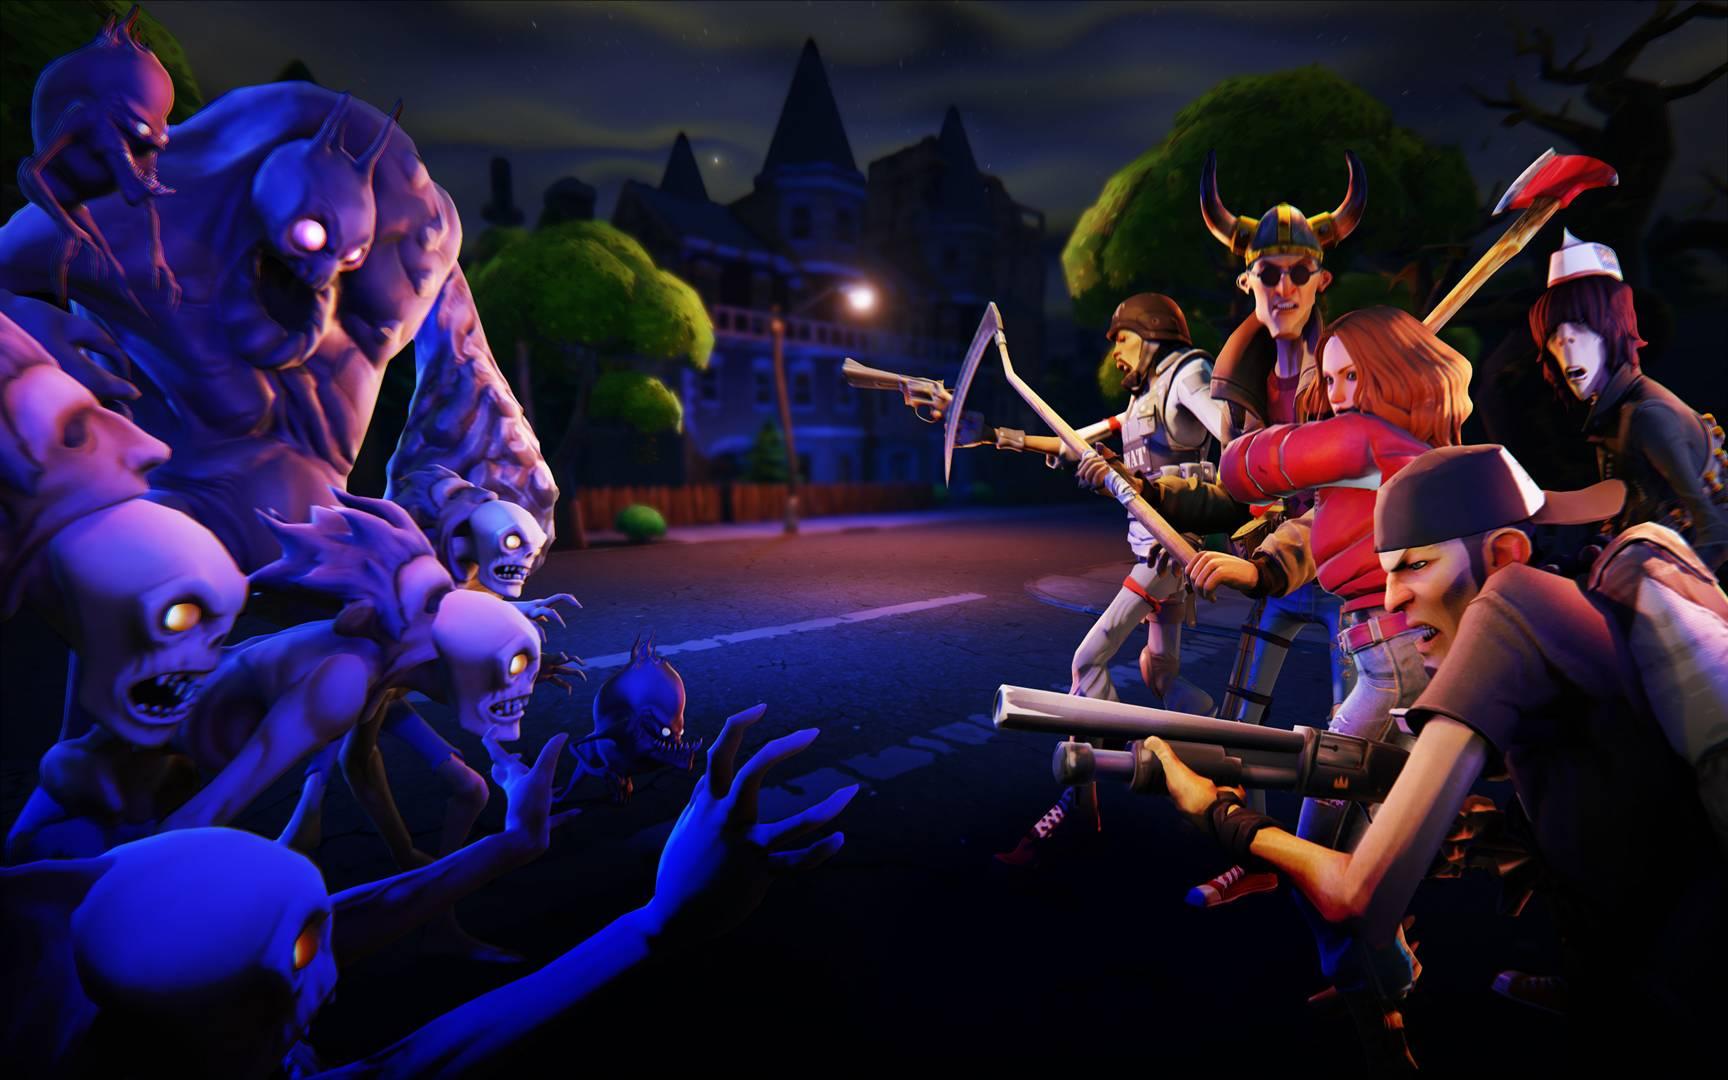 epic games fortnite wallpaper GamingBoltcom Video Game News 1728x1080